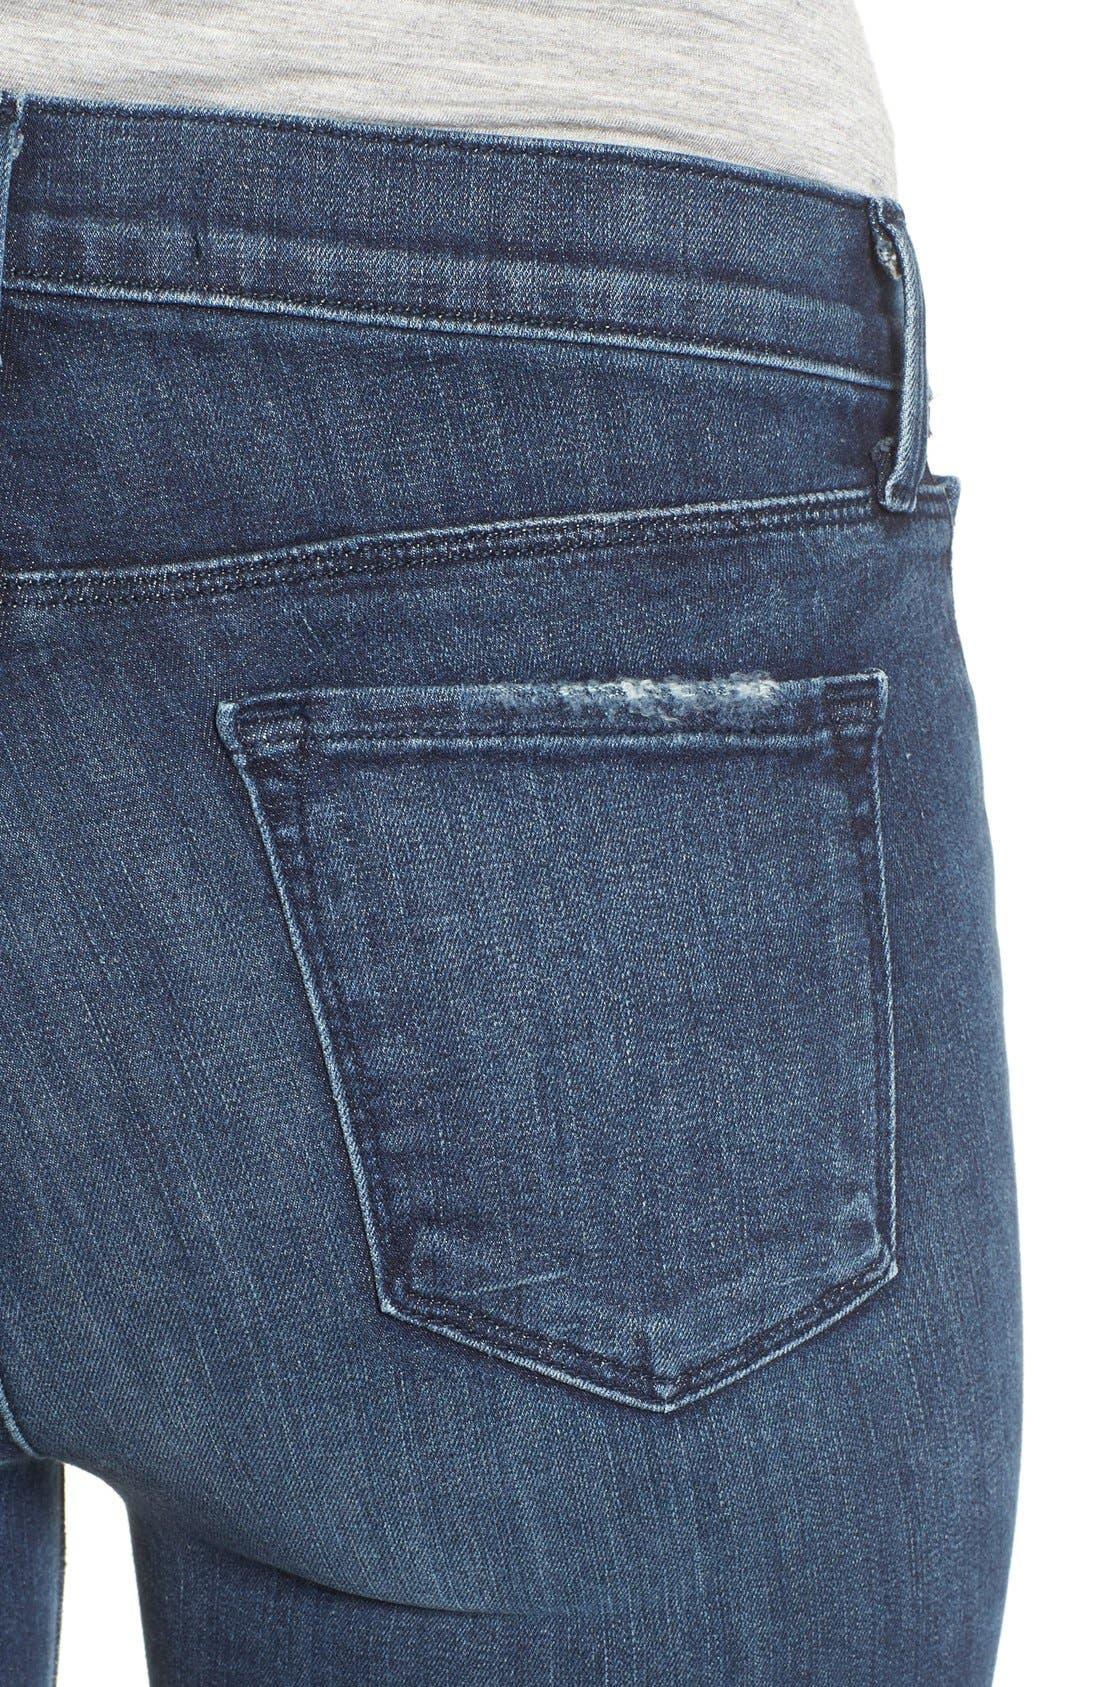 J BRAND, '811' Ankle Skinny Jeans, Alternate thumbnail 4, color, 401